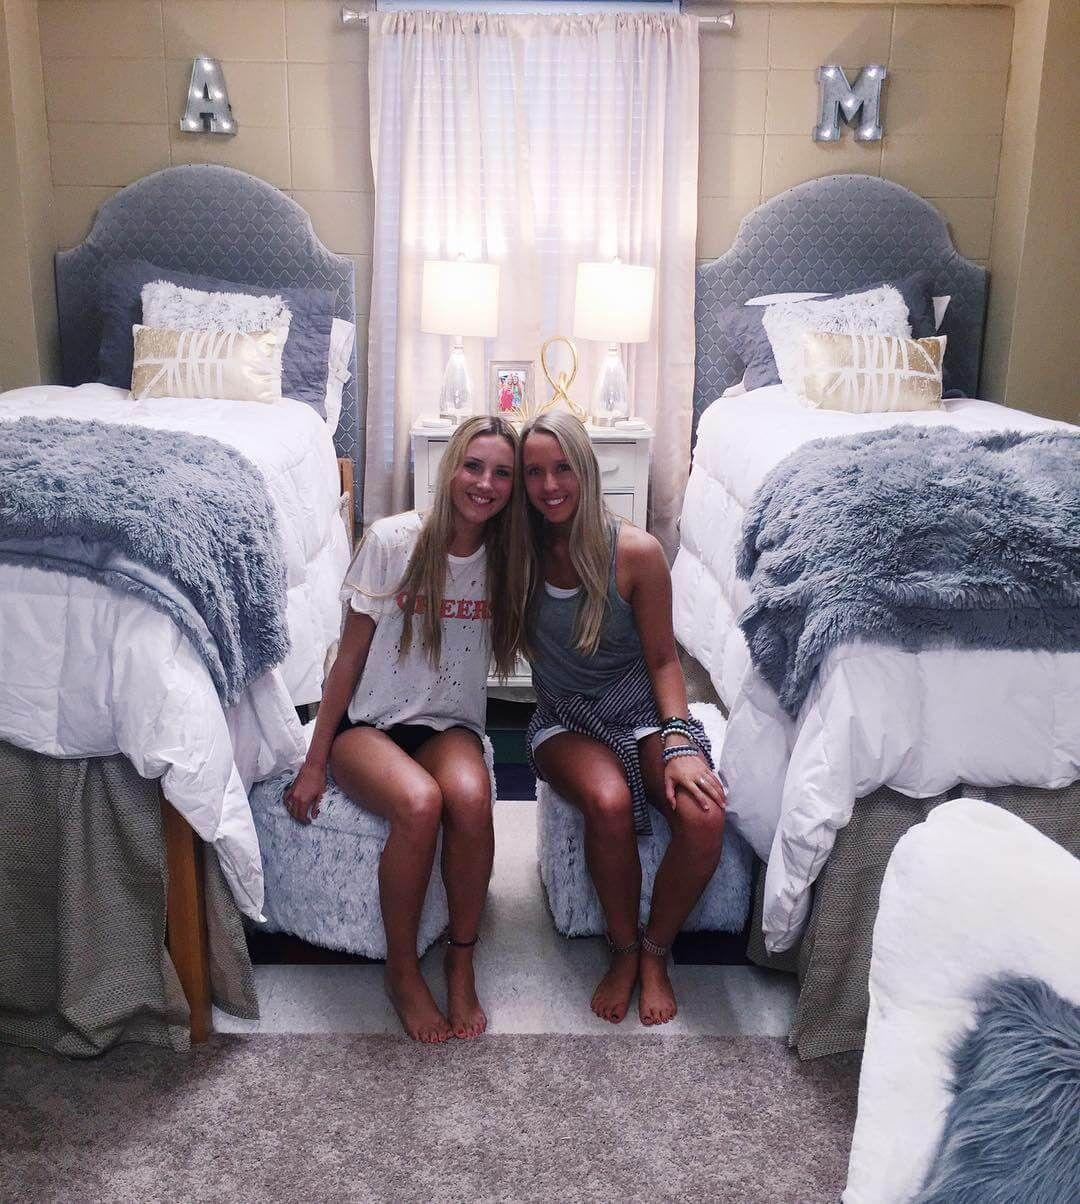 Ritz Carlton Or College Dorm Room You Tell Us Curtsy Girls